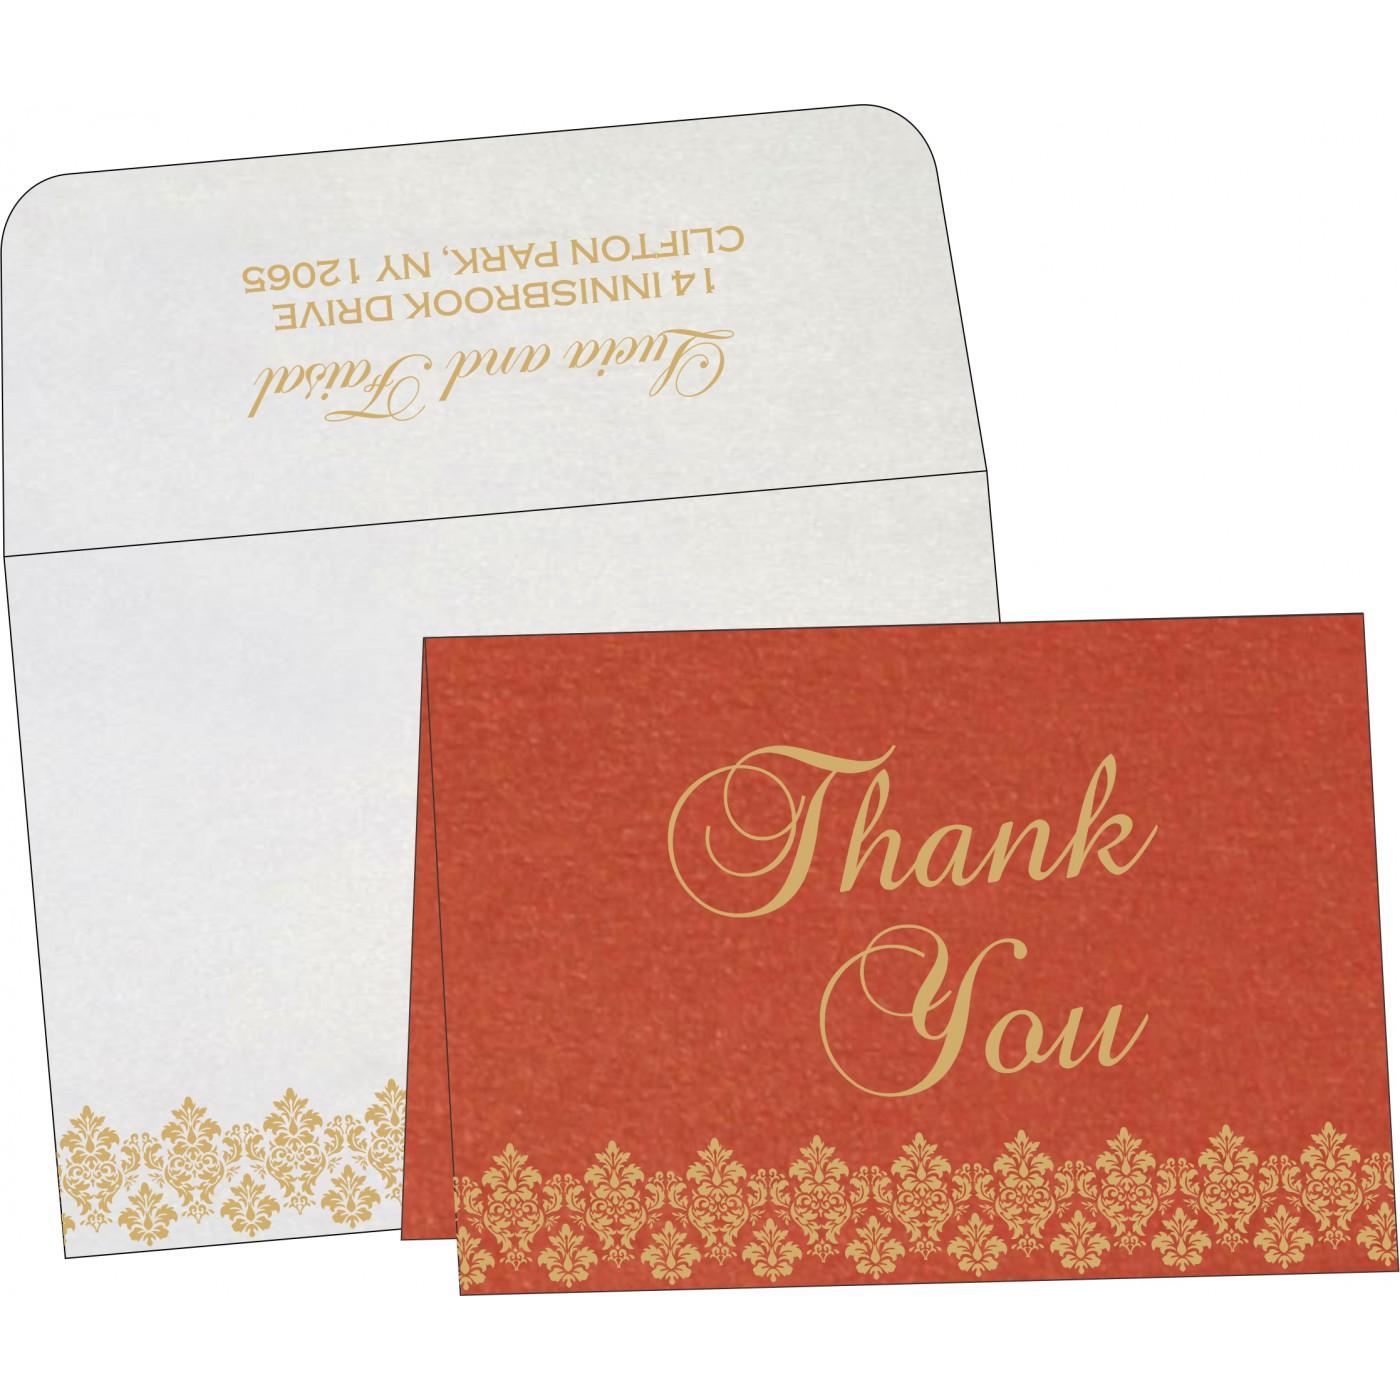 Thank You Cards : TYC-5016A - 123WeddingCards